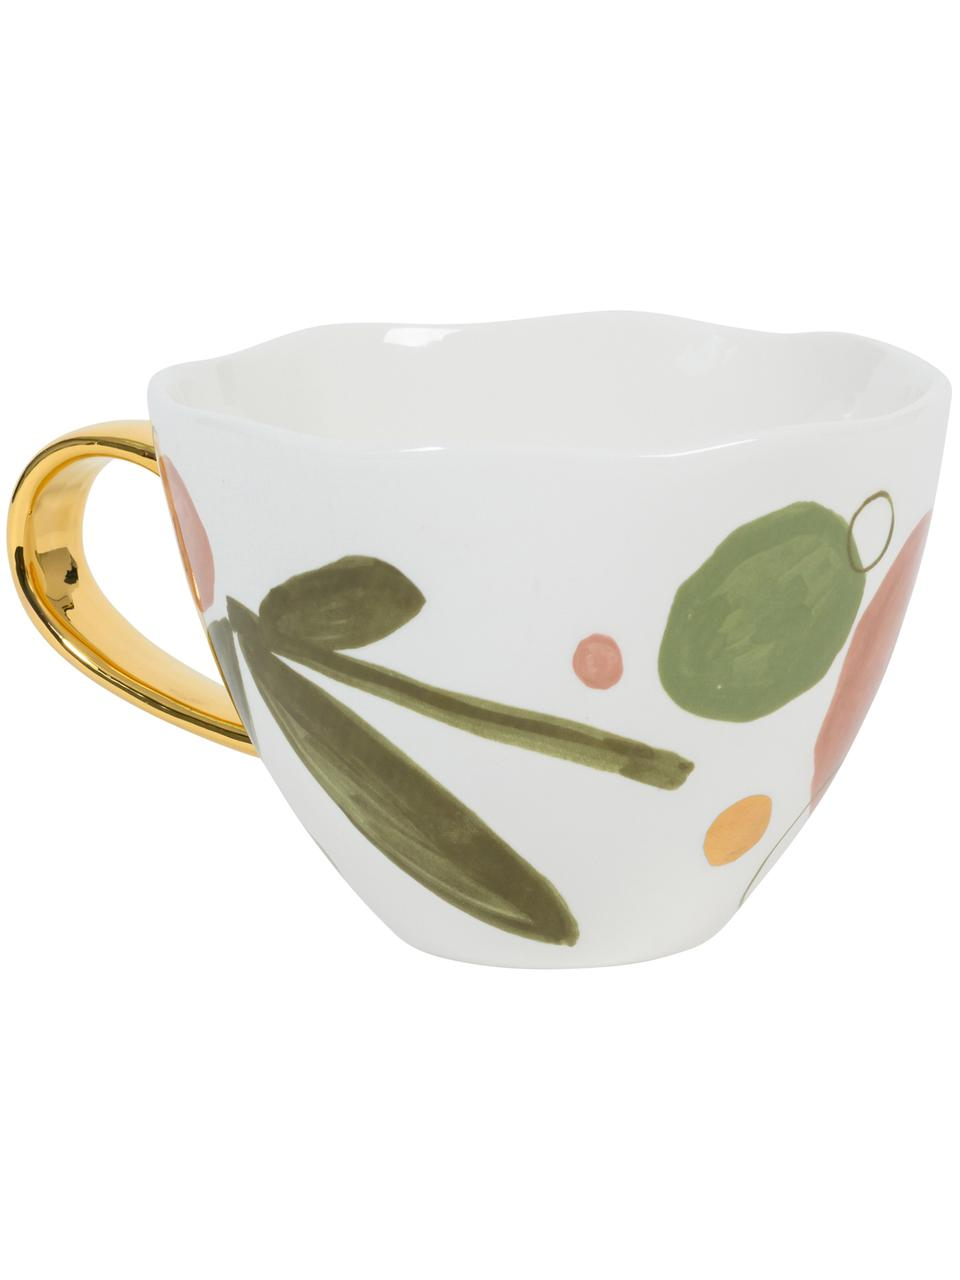 Bemalte Tasse Good Morning Expressive mit goldenem Griff, New Bone China, Weiß, Rosa, Grün, Goldfarben, Ø 11 x H 9 cm